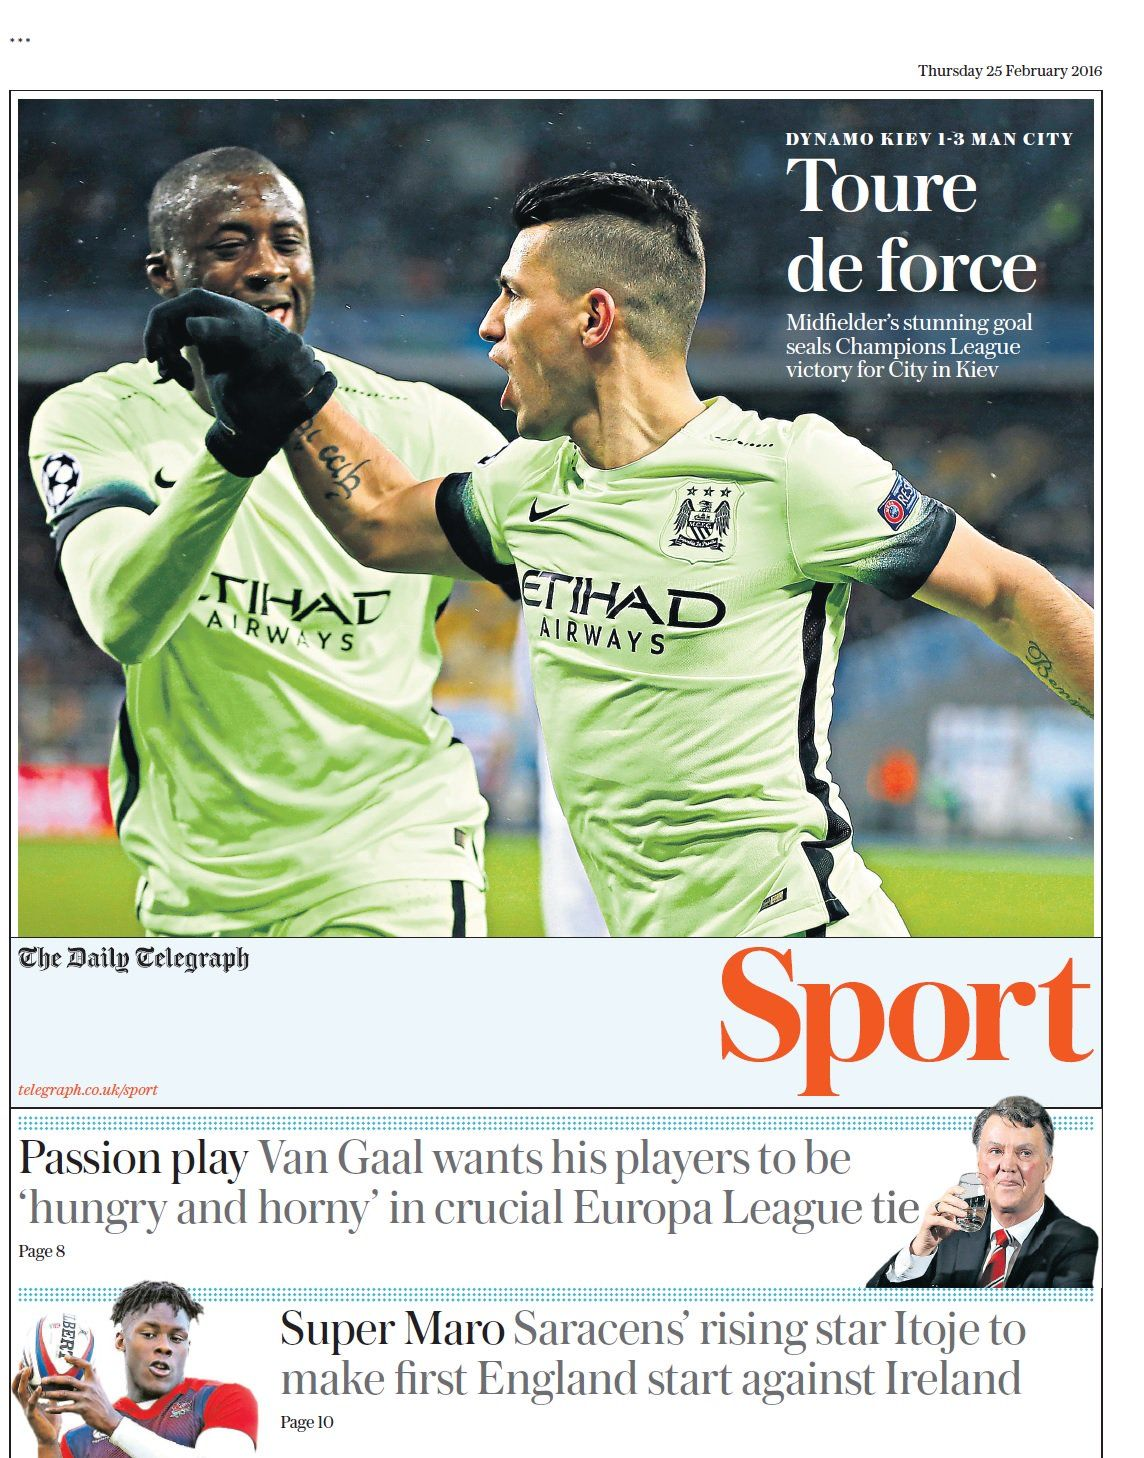 Thursday's Telegraph Sport: Toure de force #tomorrowspaperstoday #bbcpapers https://t.co/6jVq4ZqtsF